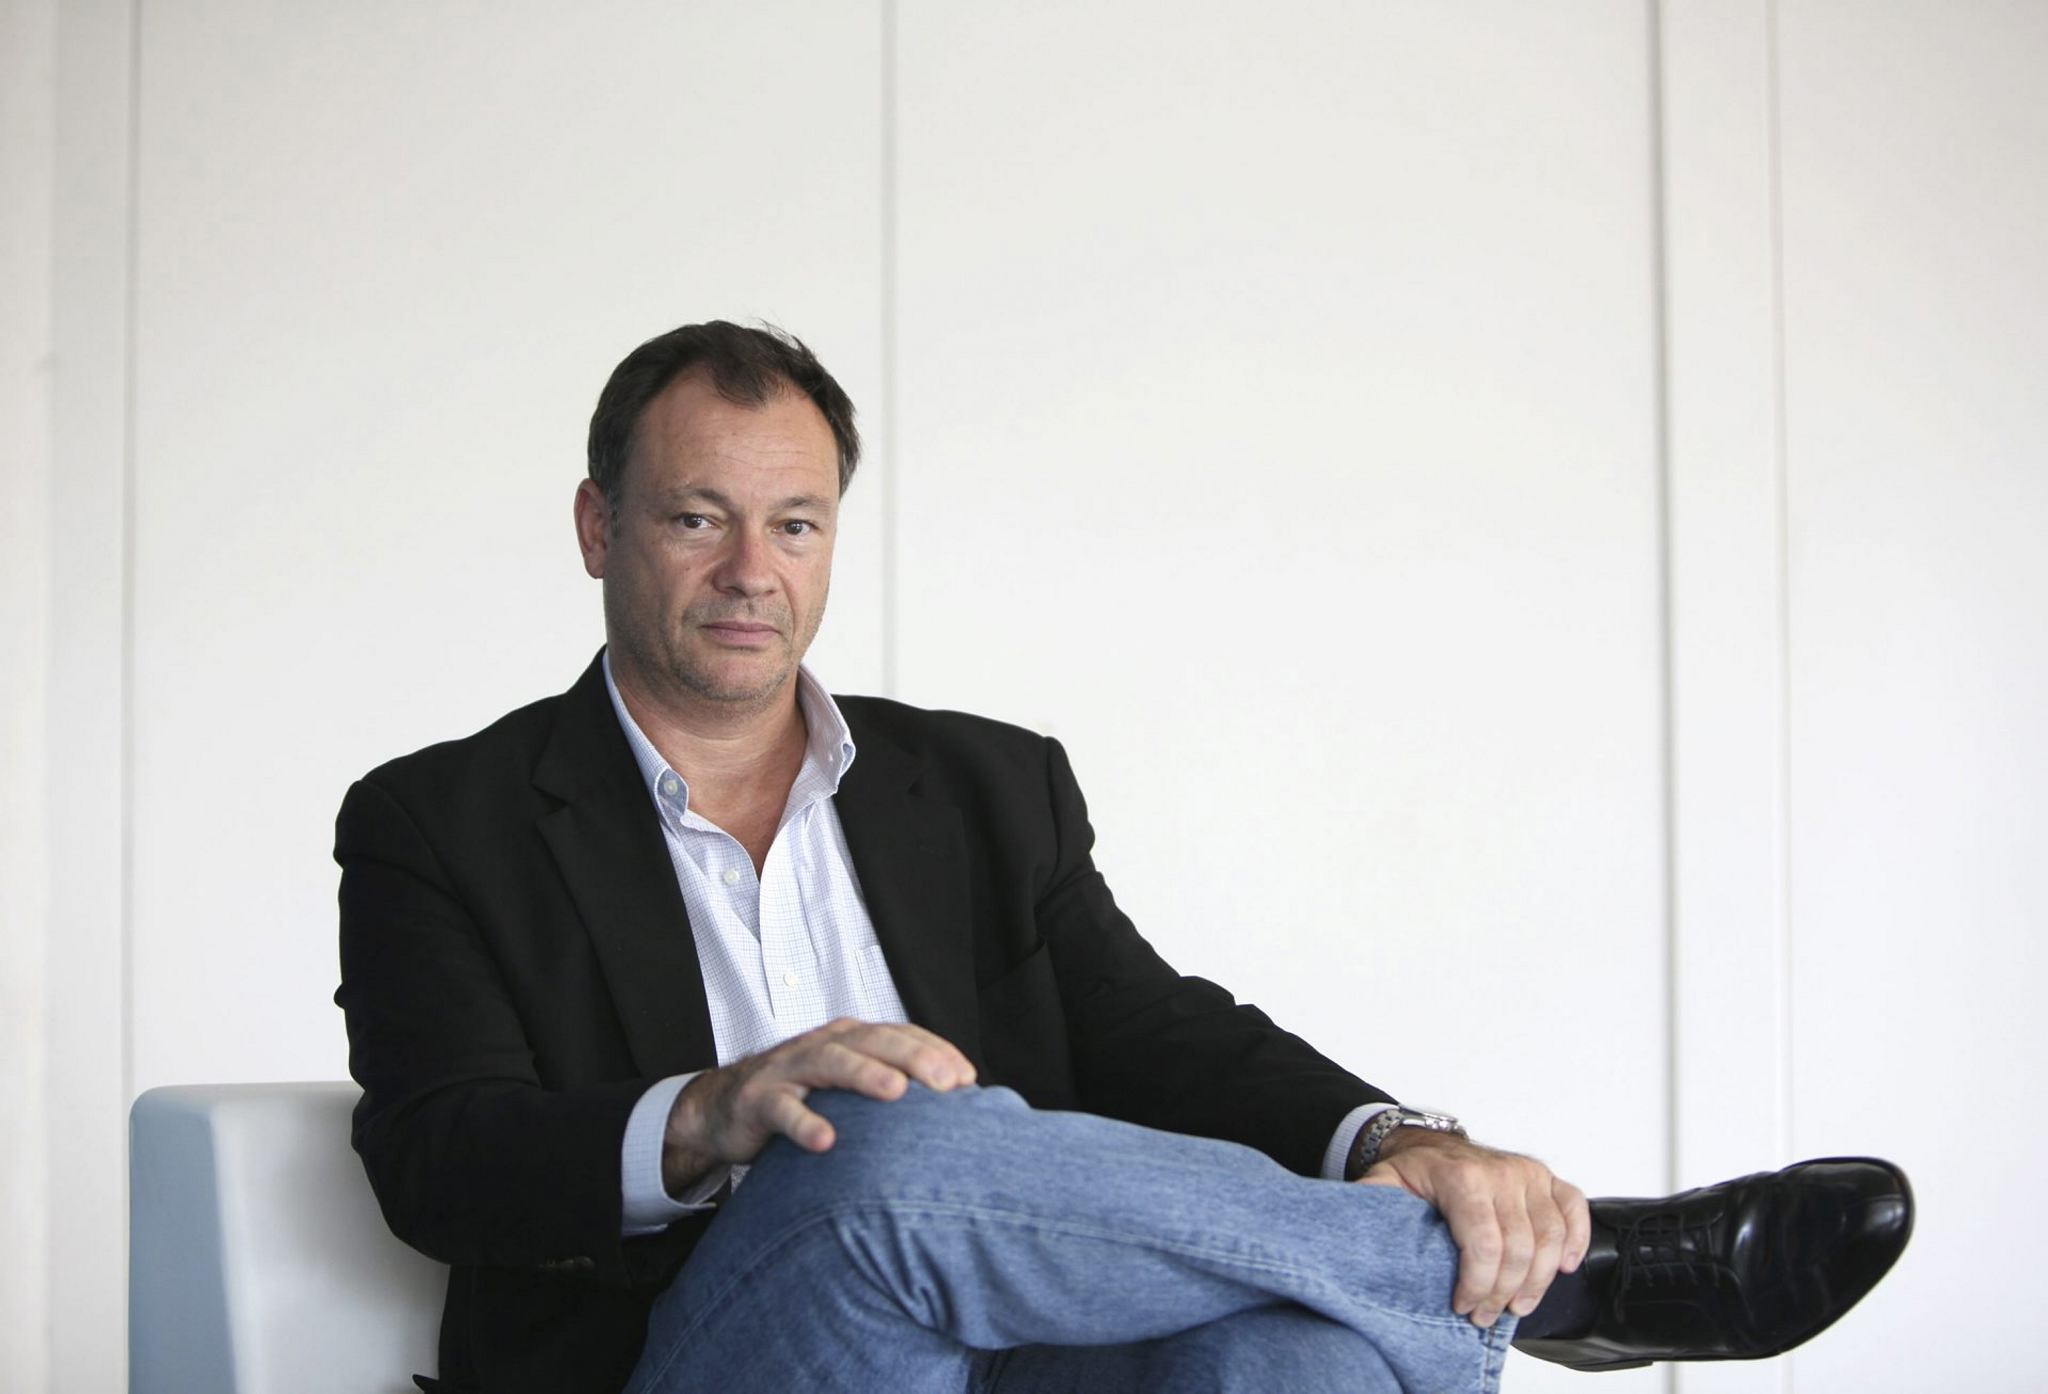 MICHAEL LÓPEZ-ALEGRÍA